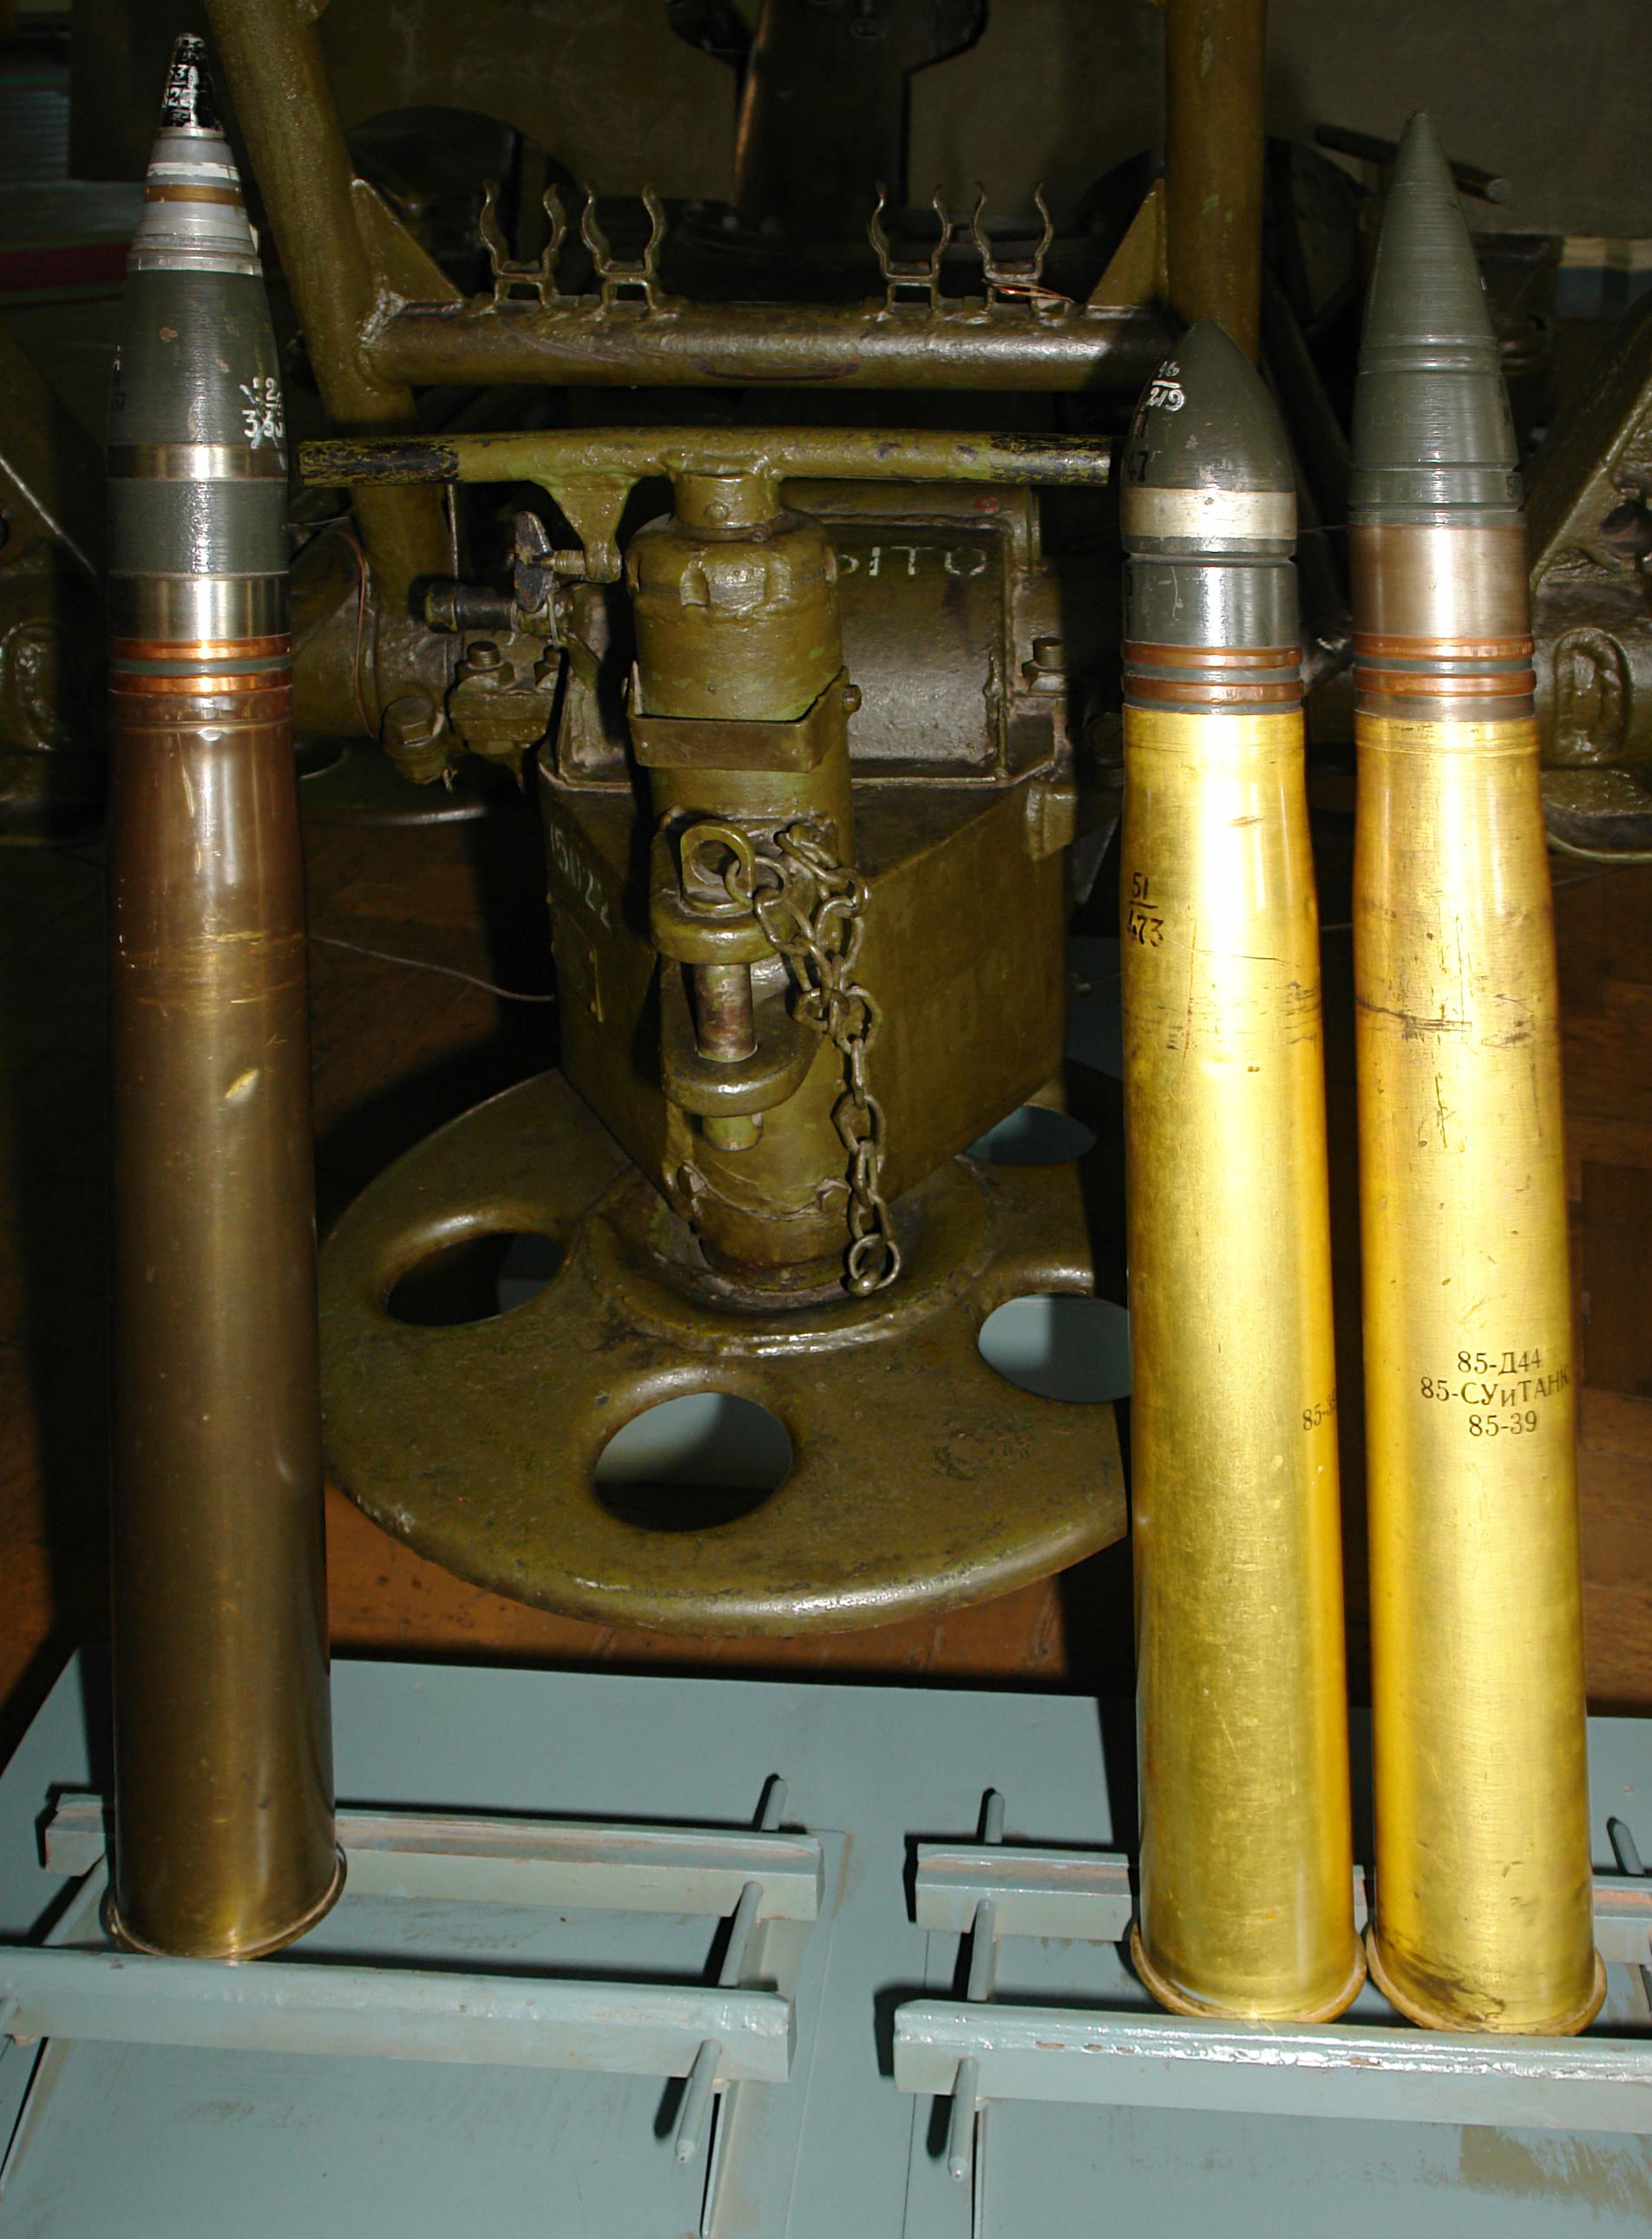 https://upload.wikimedia.org/wikipedia/commons/2/22/85-мм_зенитная_пушка_образца_1944_года_(снаряды).jpg